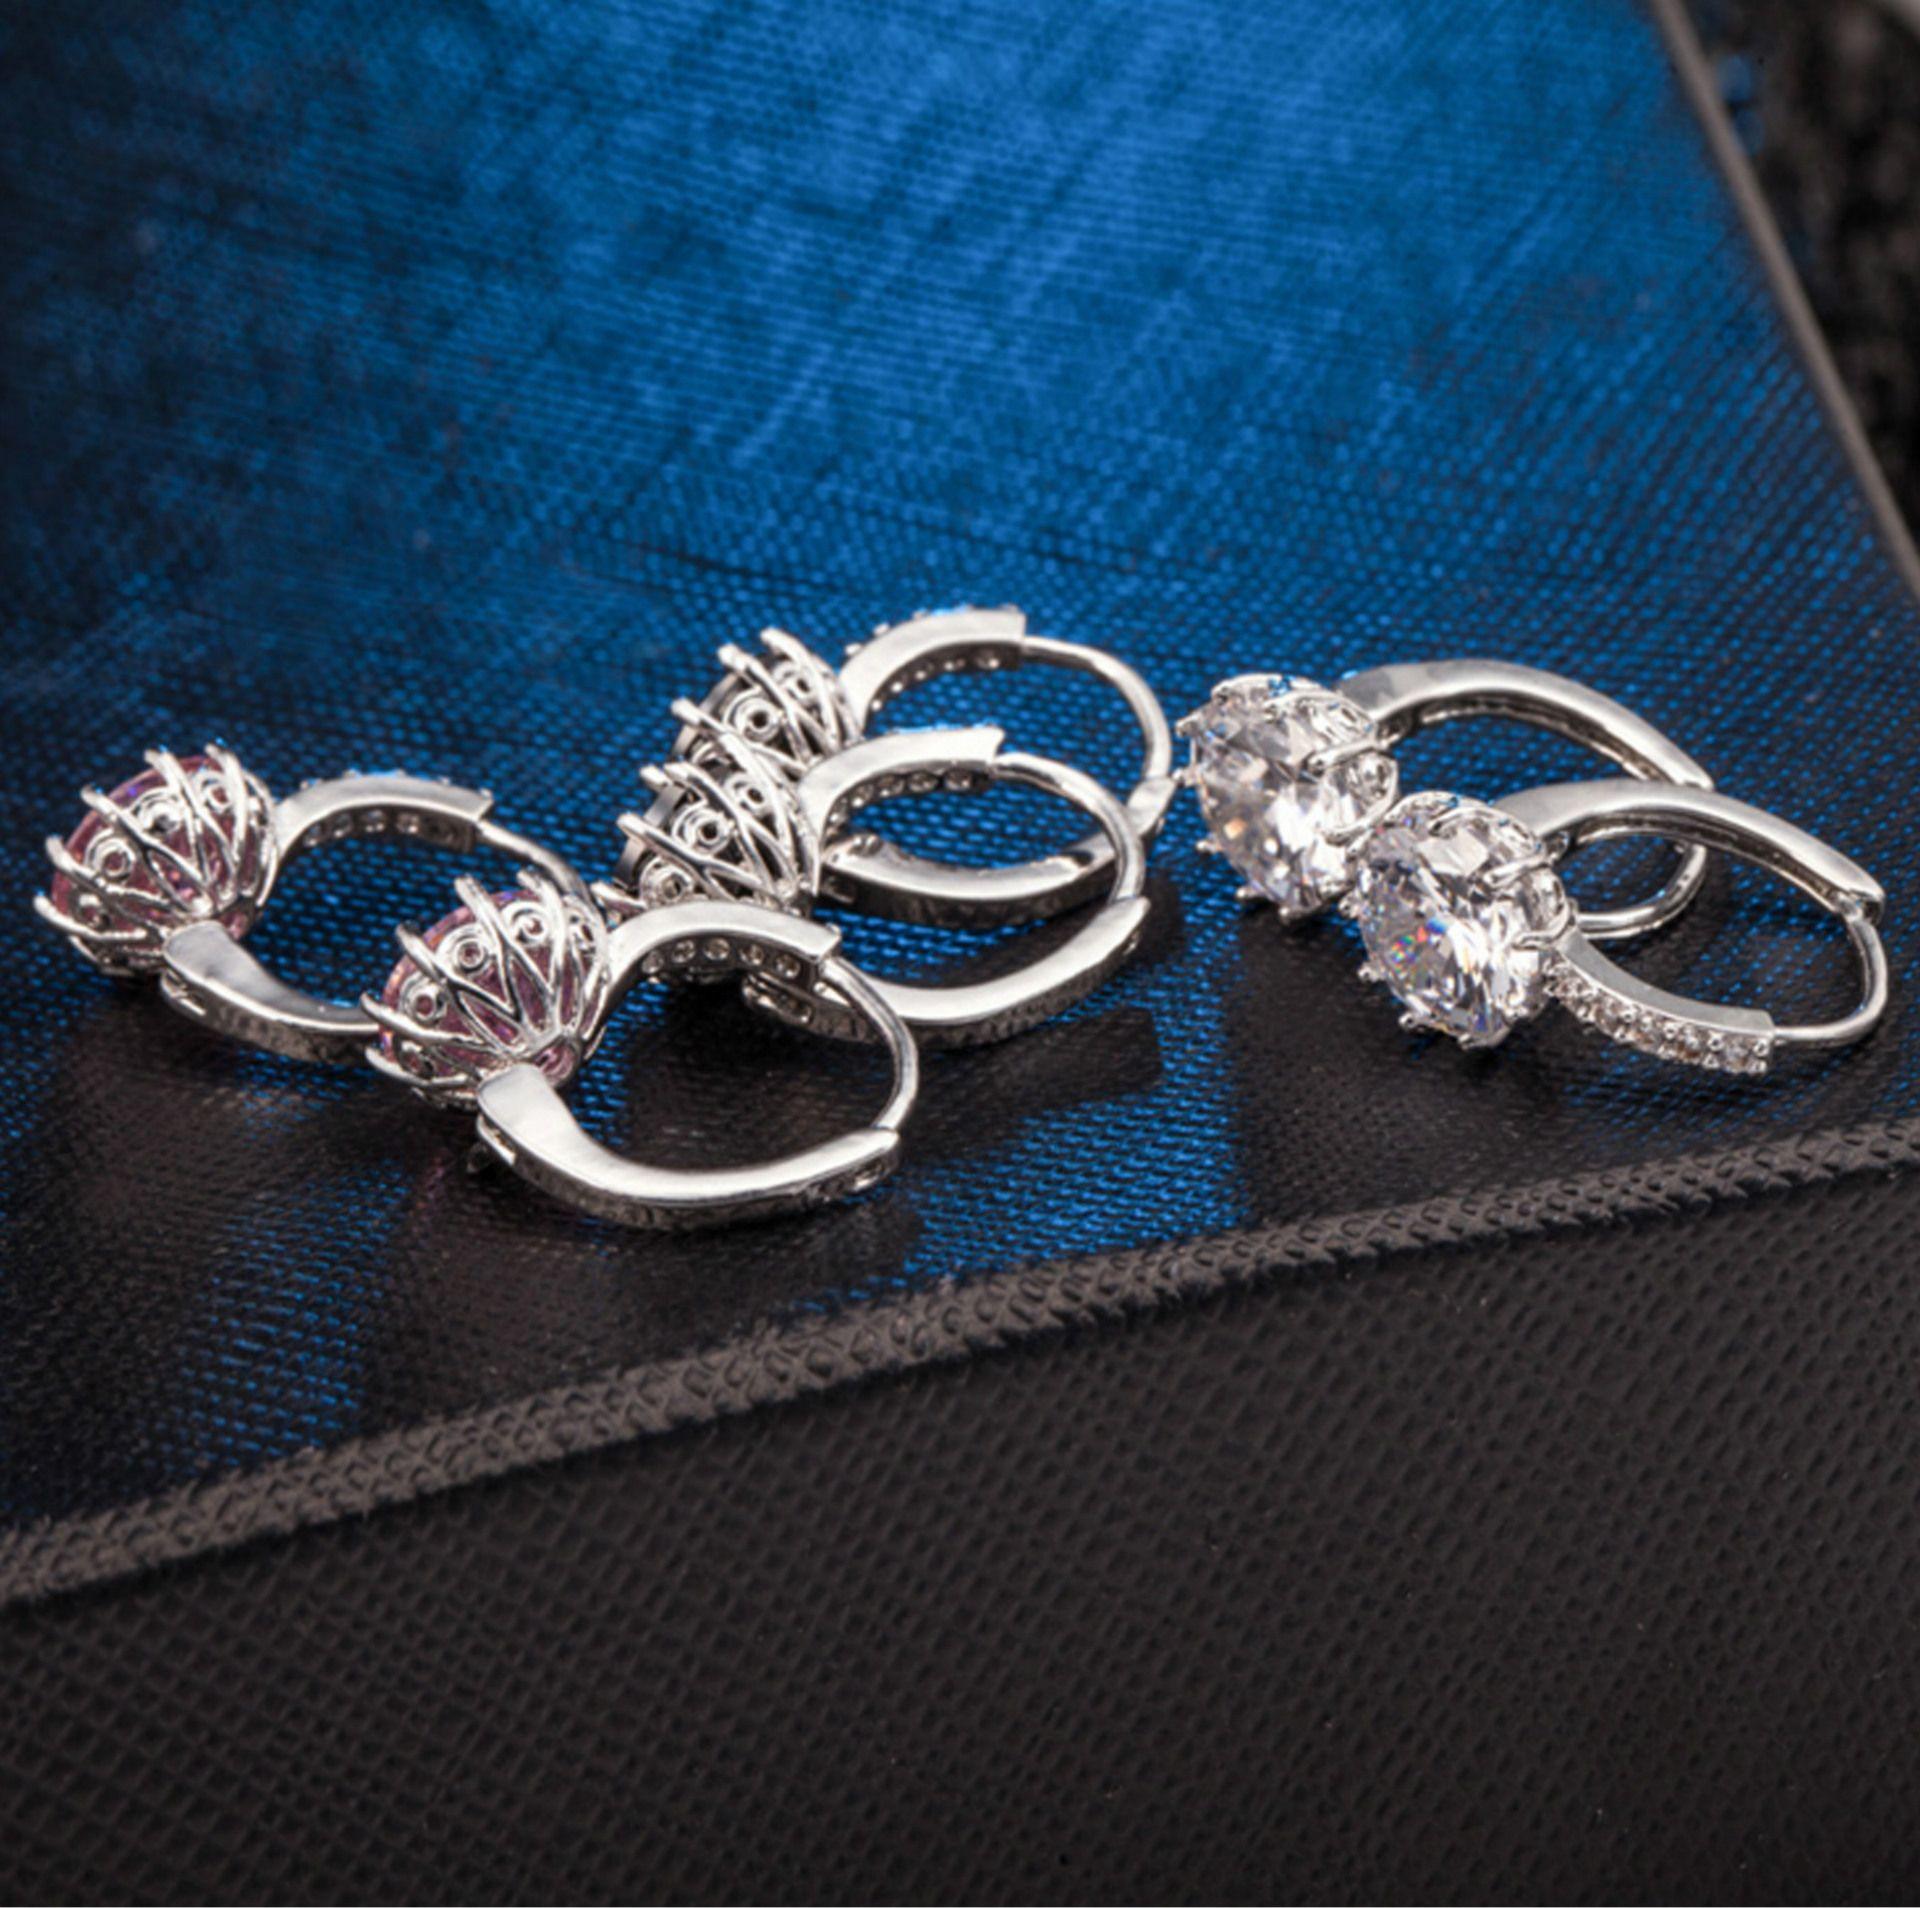 Gros nouveau 925 Sterling Silver Ear Crochet cristal strass Hoop boucles d'oreilles